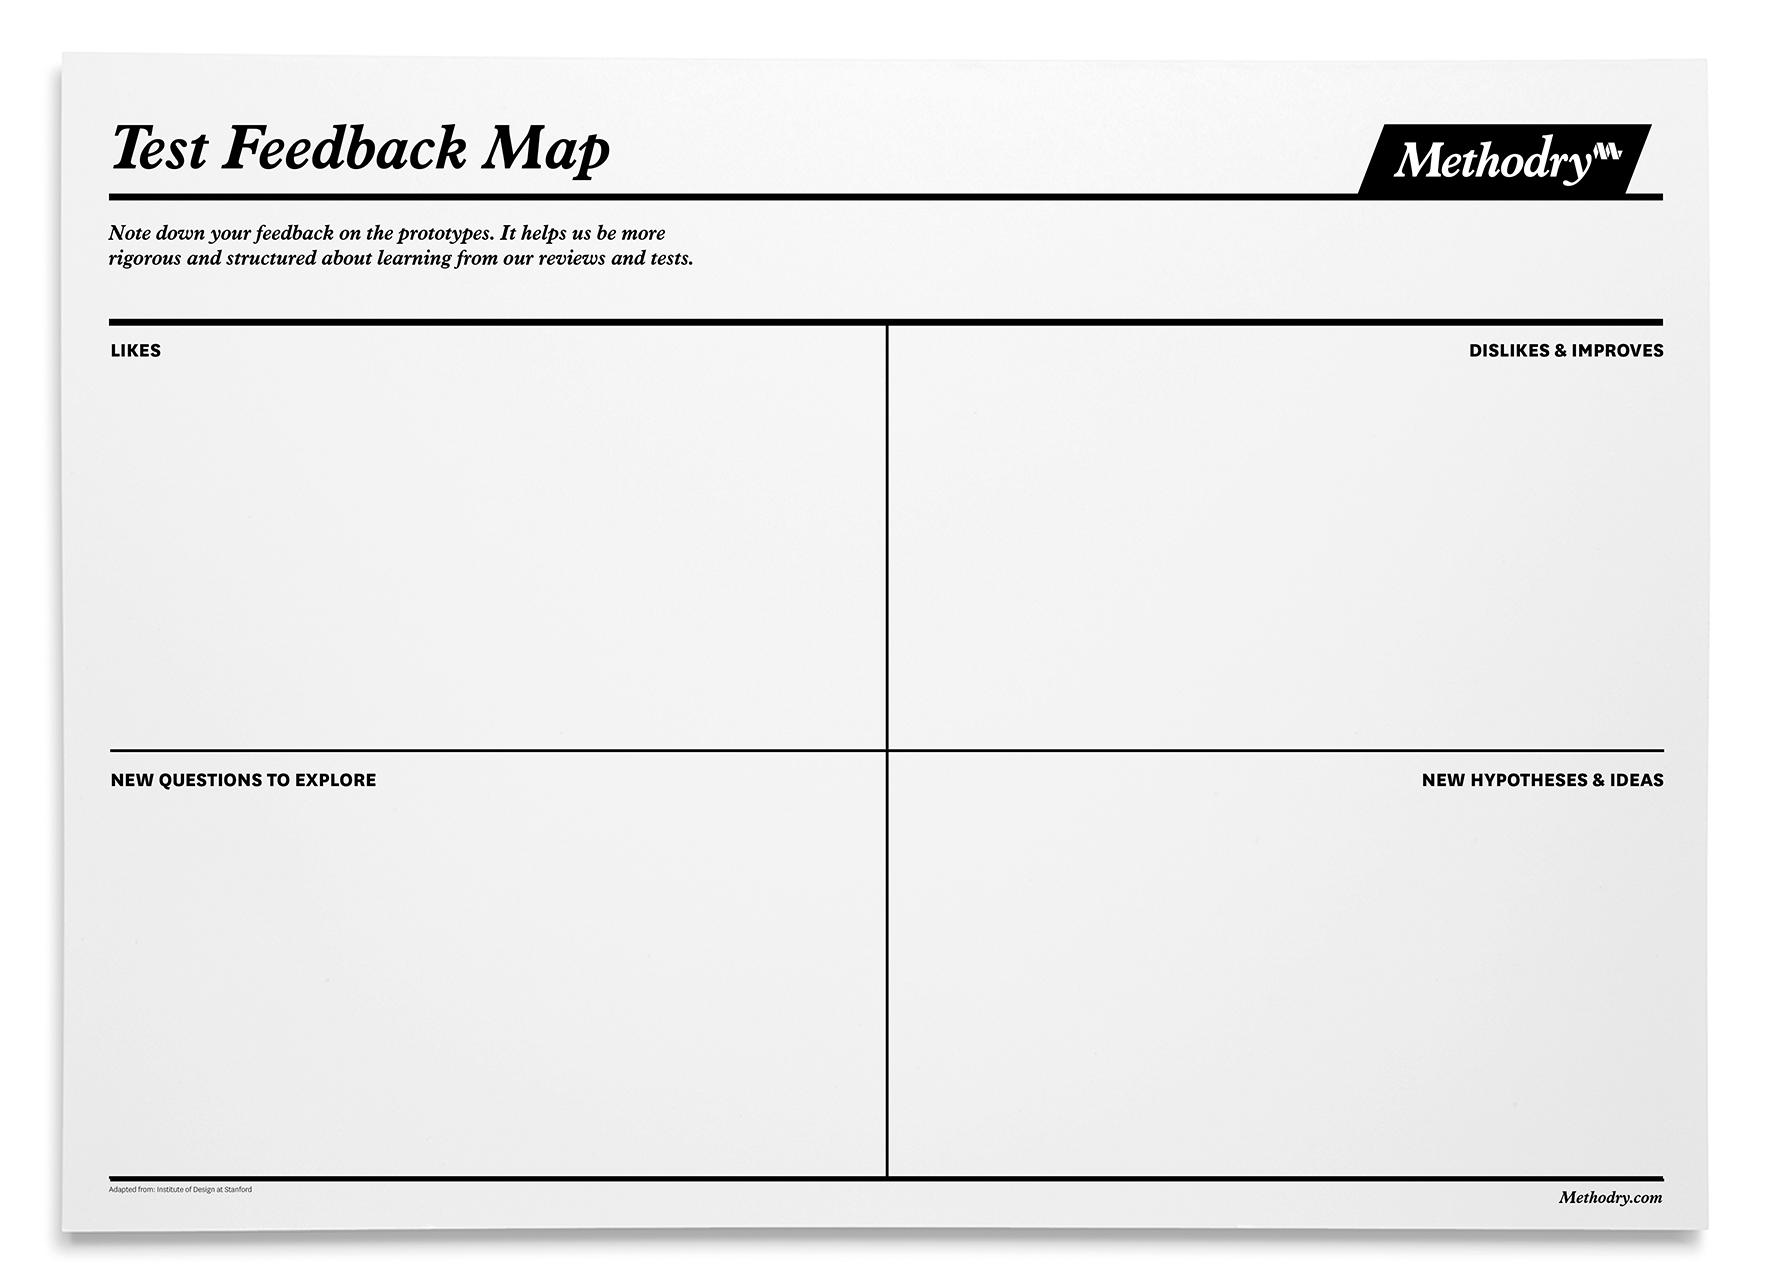 Methodry_Test_Feedback_Map